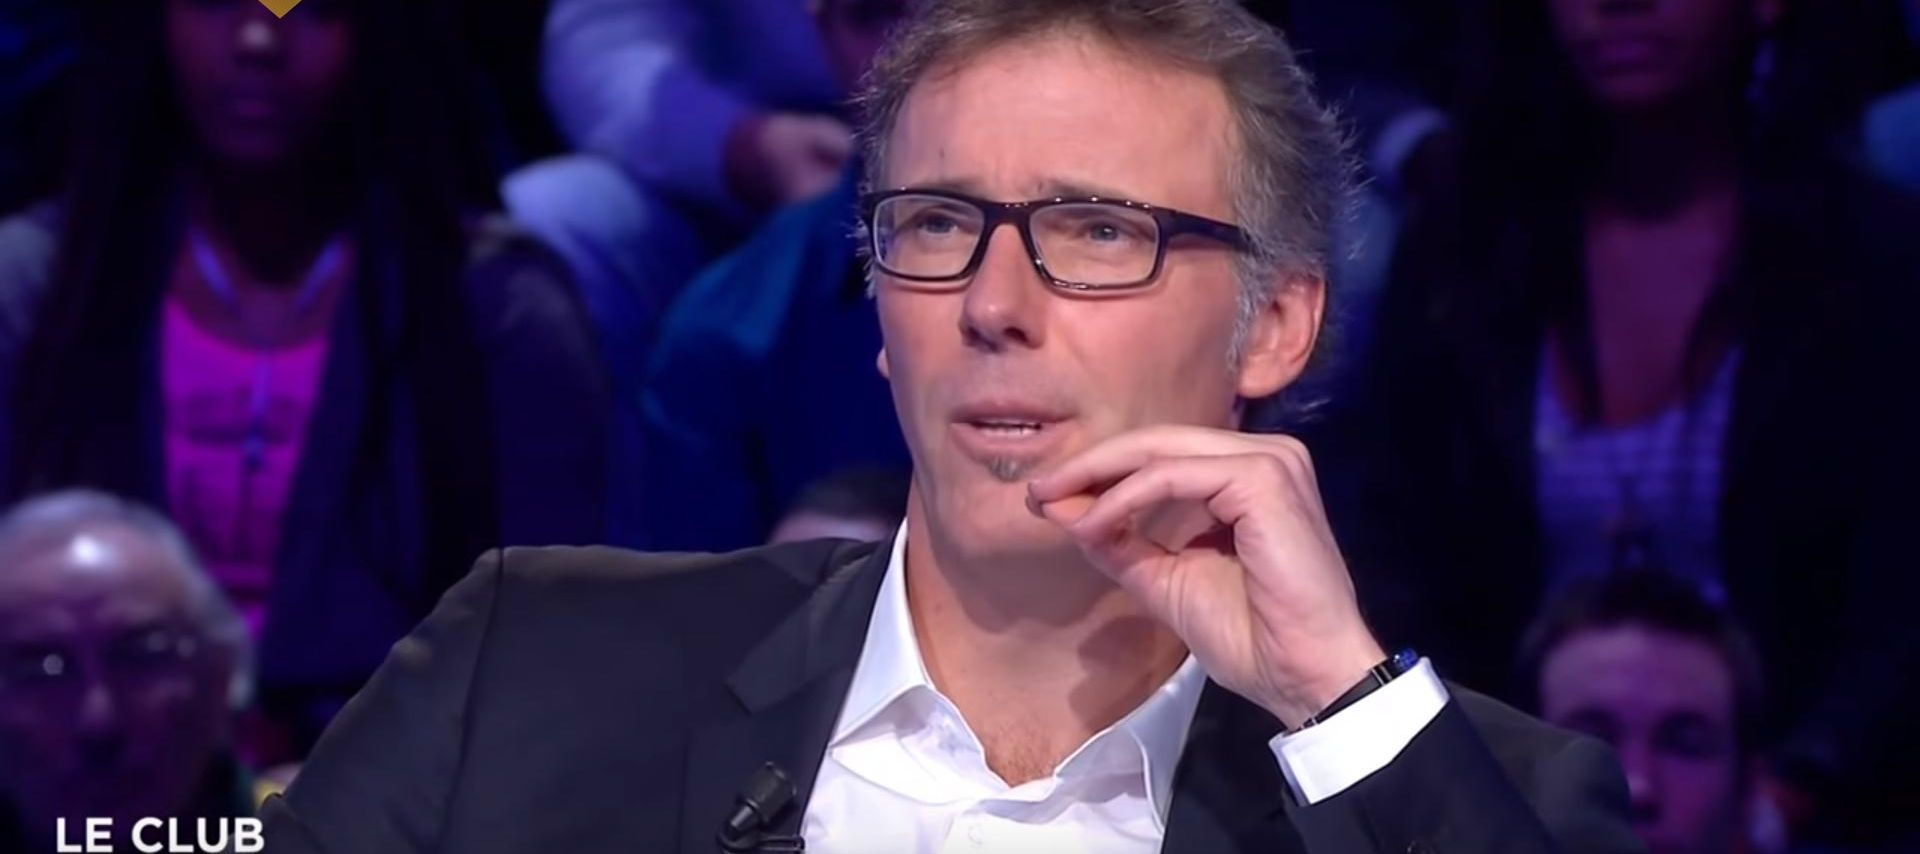 JURE PREMA NOVOM NASLOVU PRVAKA Laurent Blanc potpisao novi ugovor s PSG-om